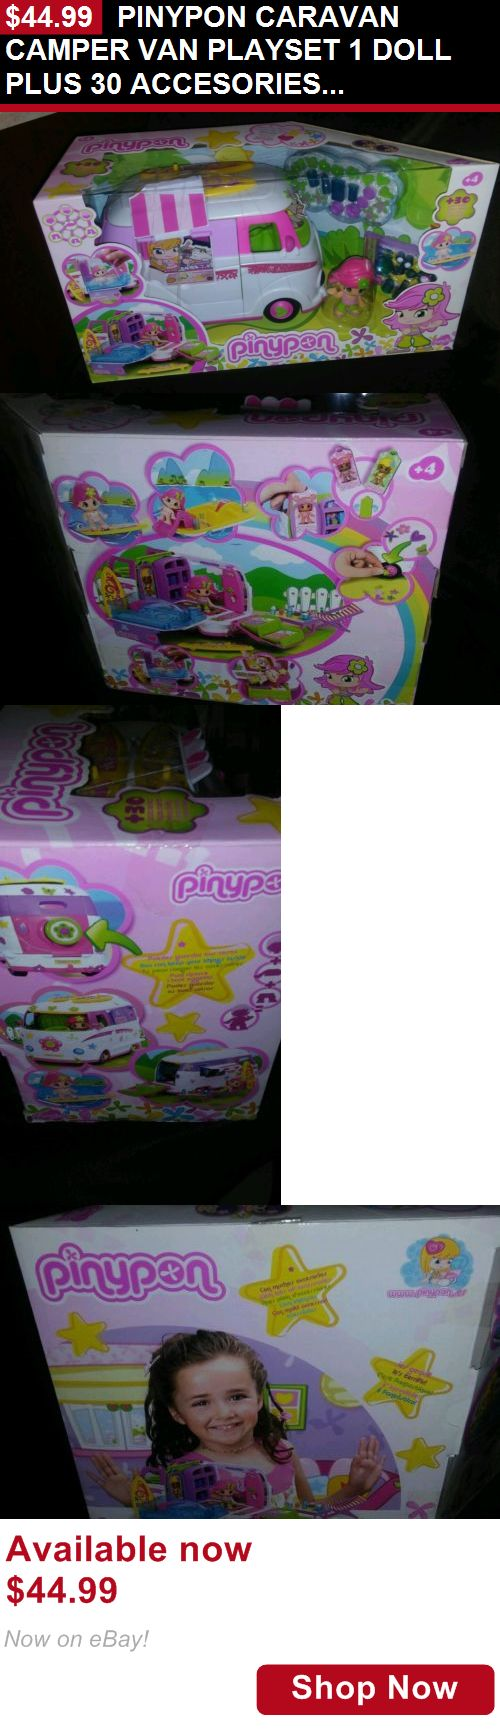 Baby Bottles: Pinypon Caravan Camper Van Playset 1 Doll Plus 30 Accesories New. BUY IT NOW ONLY: $44.99